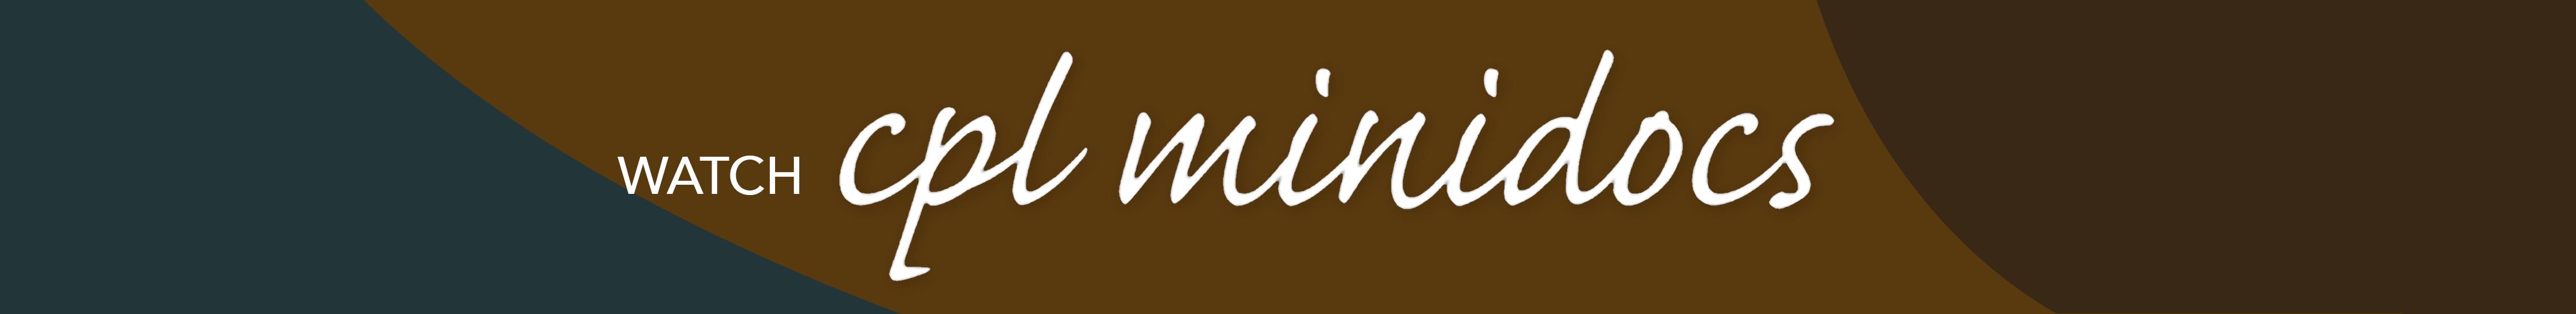 CPL Minidocs Banner 2.2